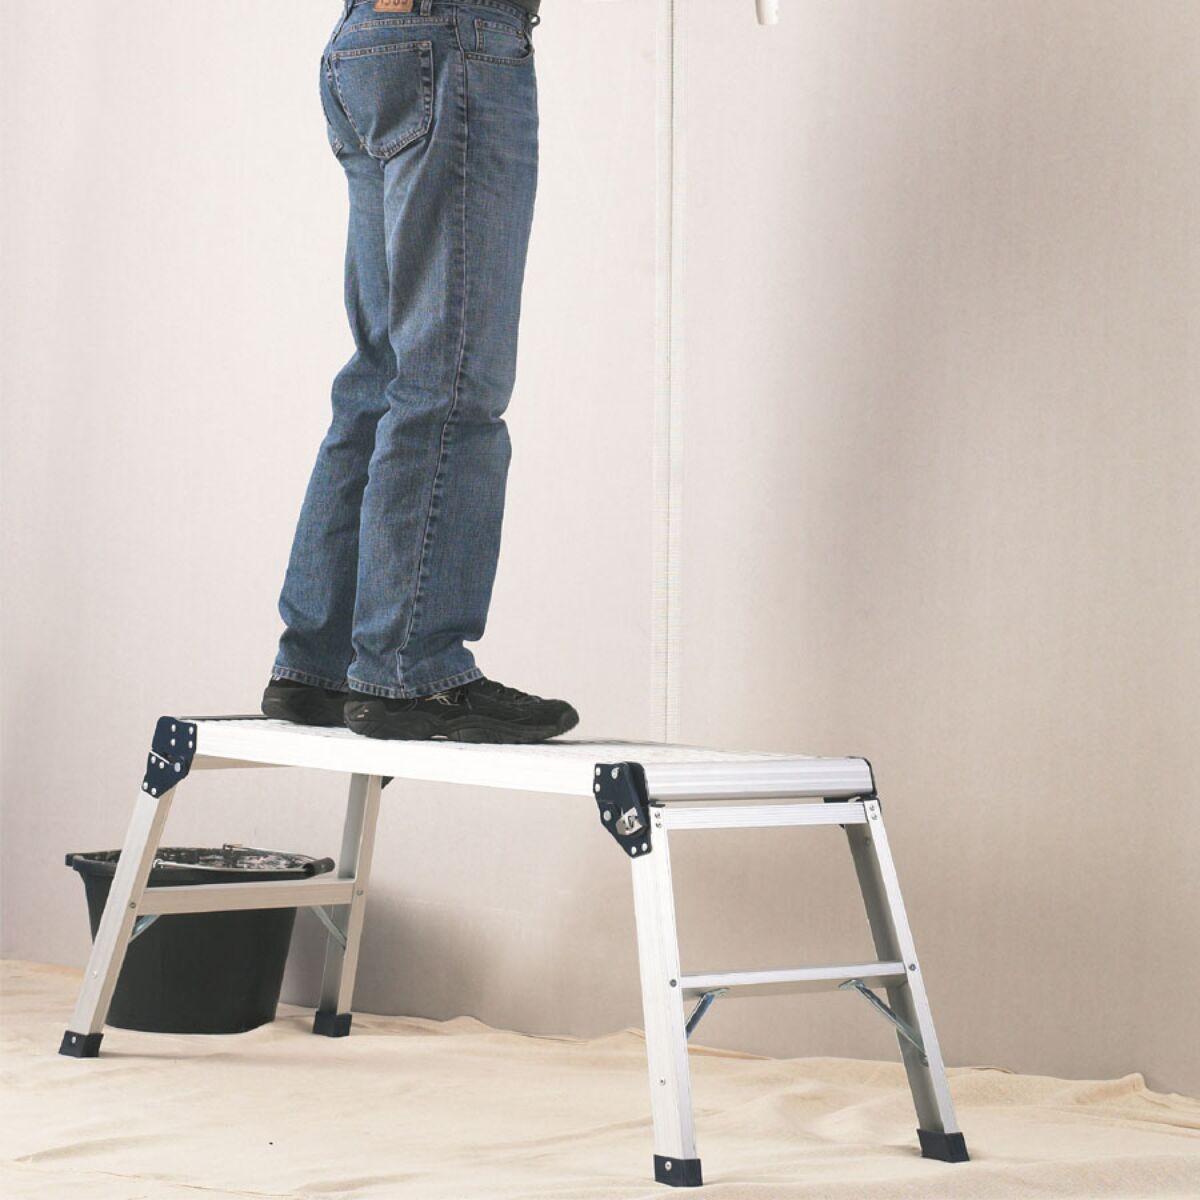 Abru Handy Work Platform Ladder now £20 free click and collect at Argos